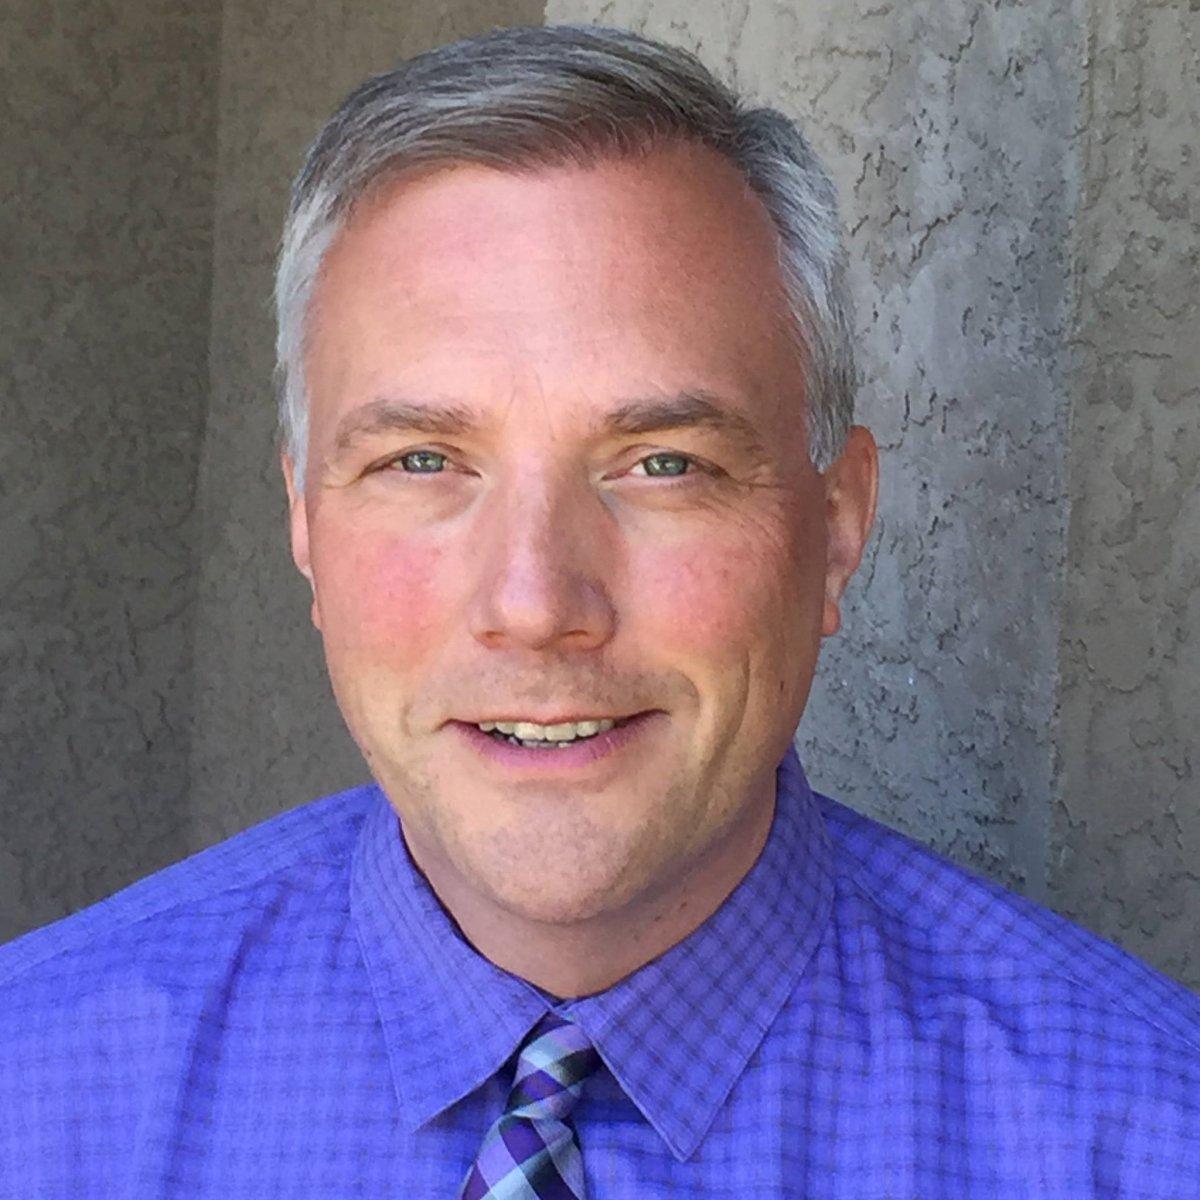 Paul Larsen is joining Global Okanagan in 2019.